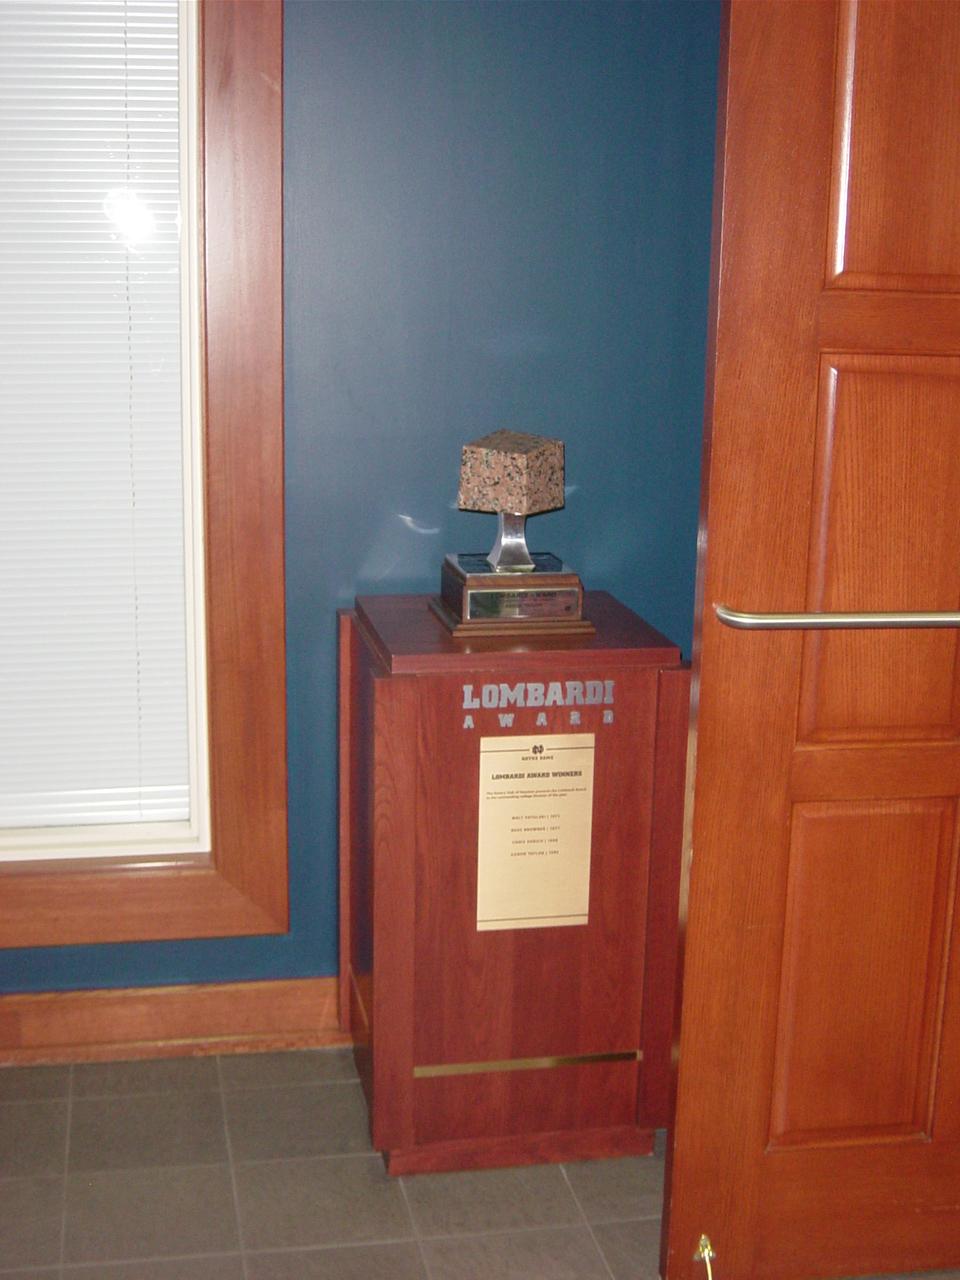 Lombardi Trophy Notre Dame